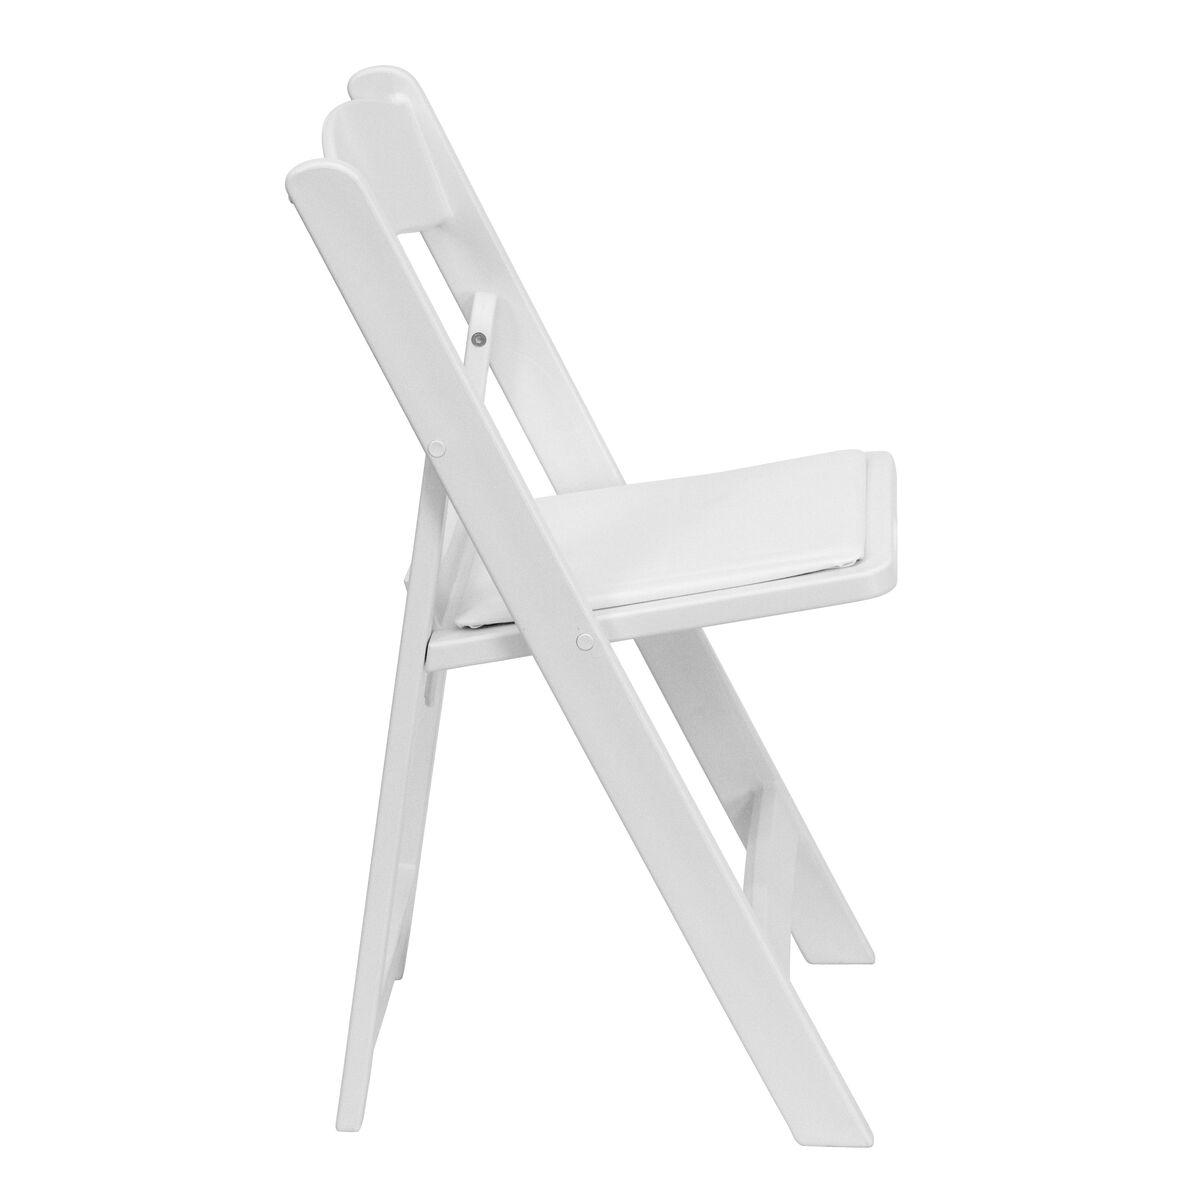 Admirable Hercules Series 1000 Lb Capacity White Resin Folding Chair With White Vinyl Padded Seat Creativecarmelina Interior Chair Design Creativecarmelinacom